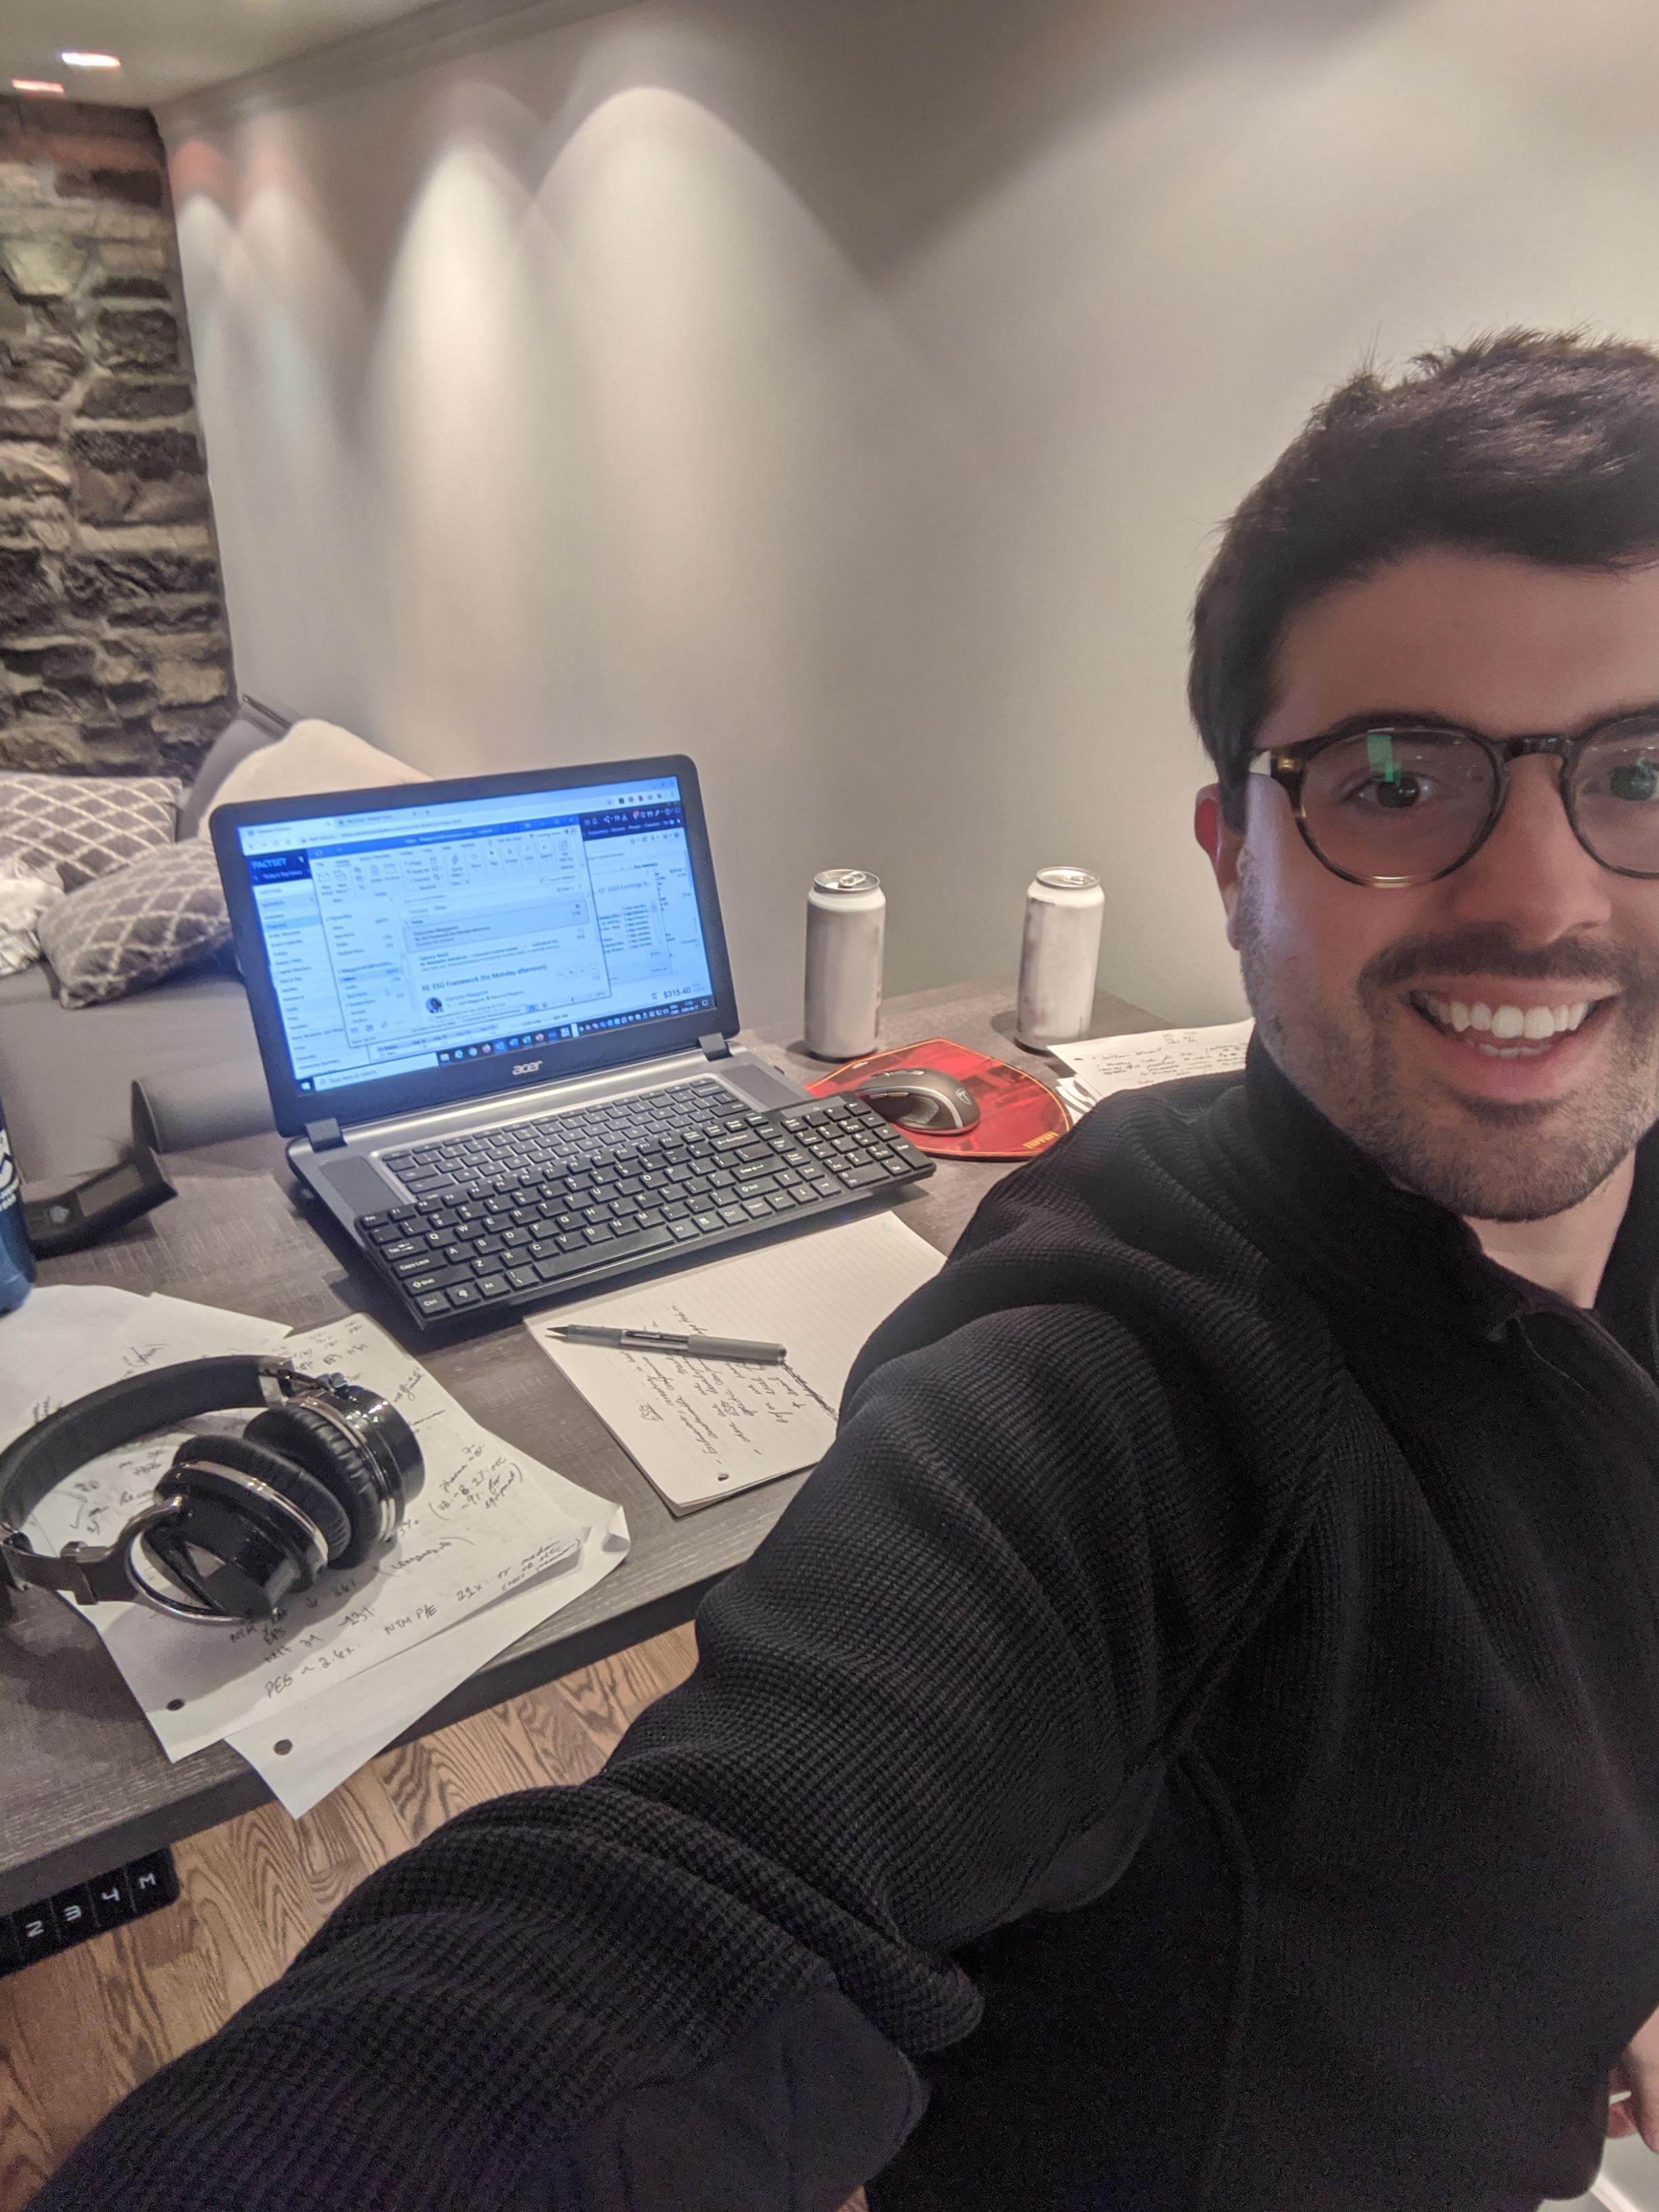 Man working on Standing Desk